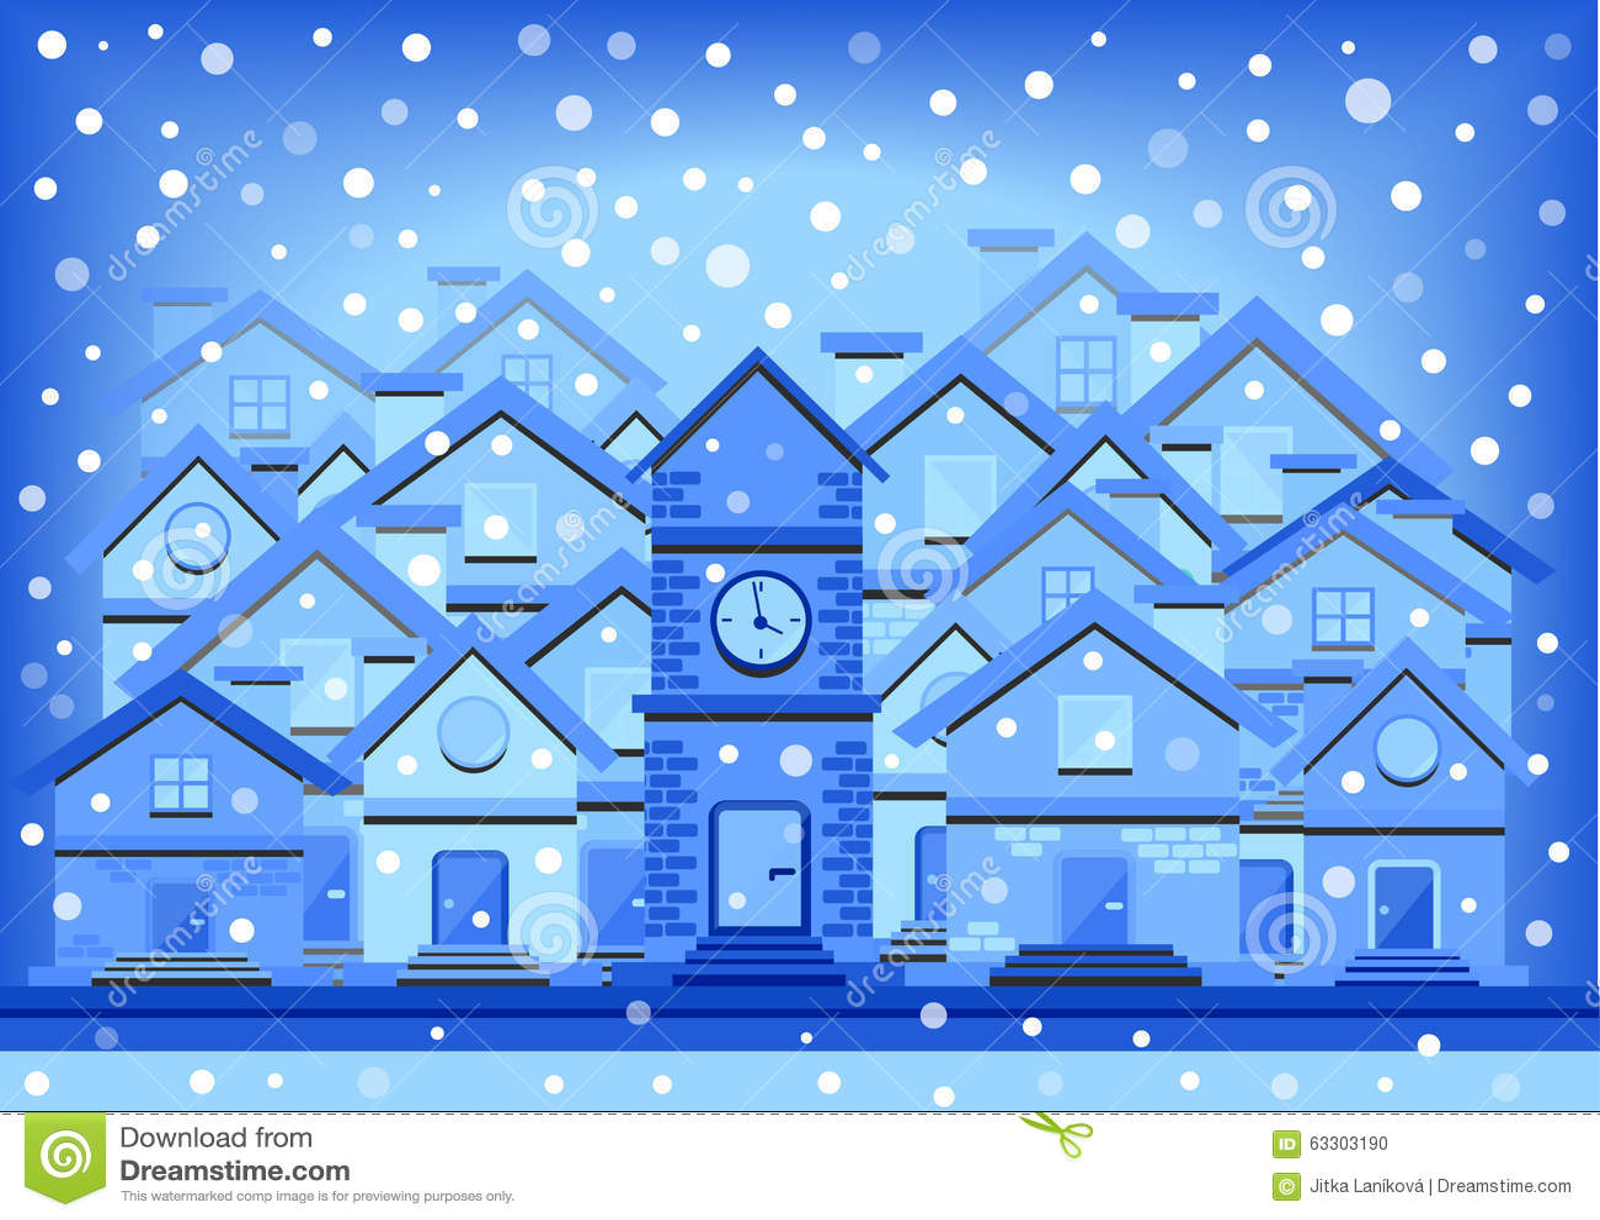 Winter flat design illustration of houses